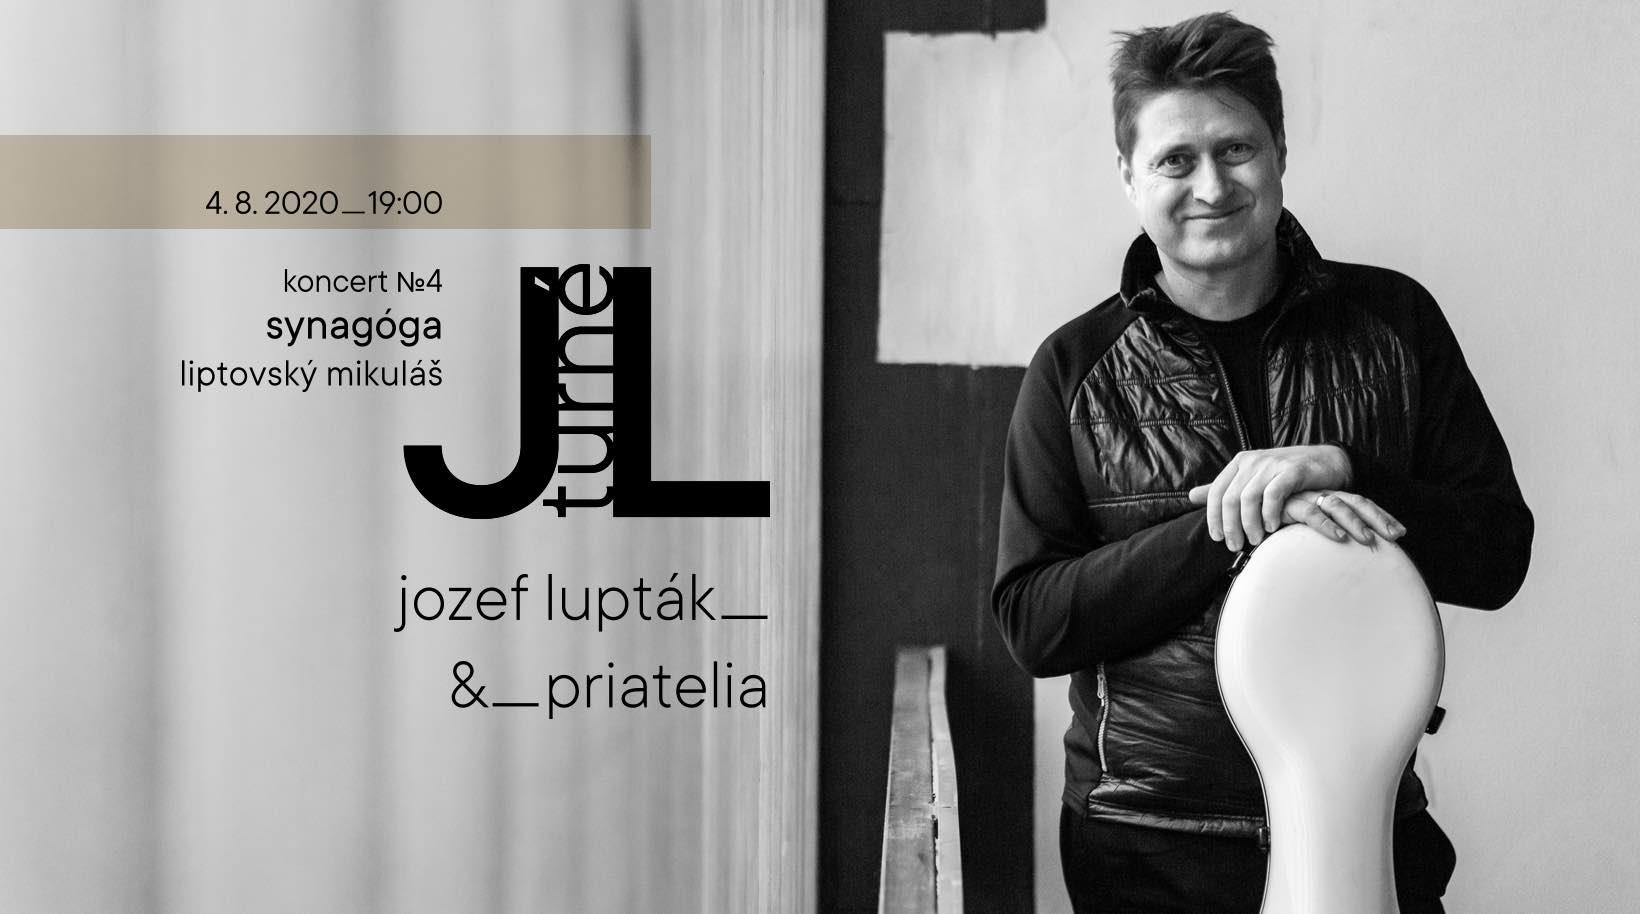 luptak_chasidske_piesne